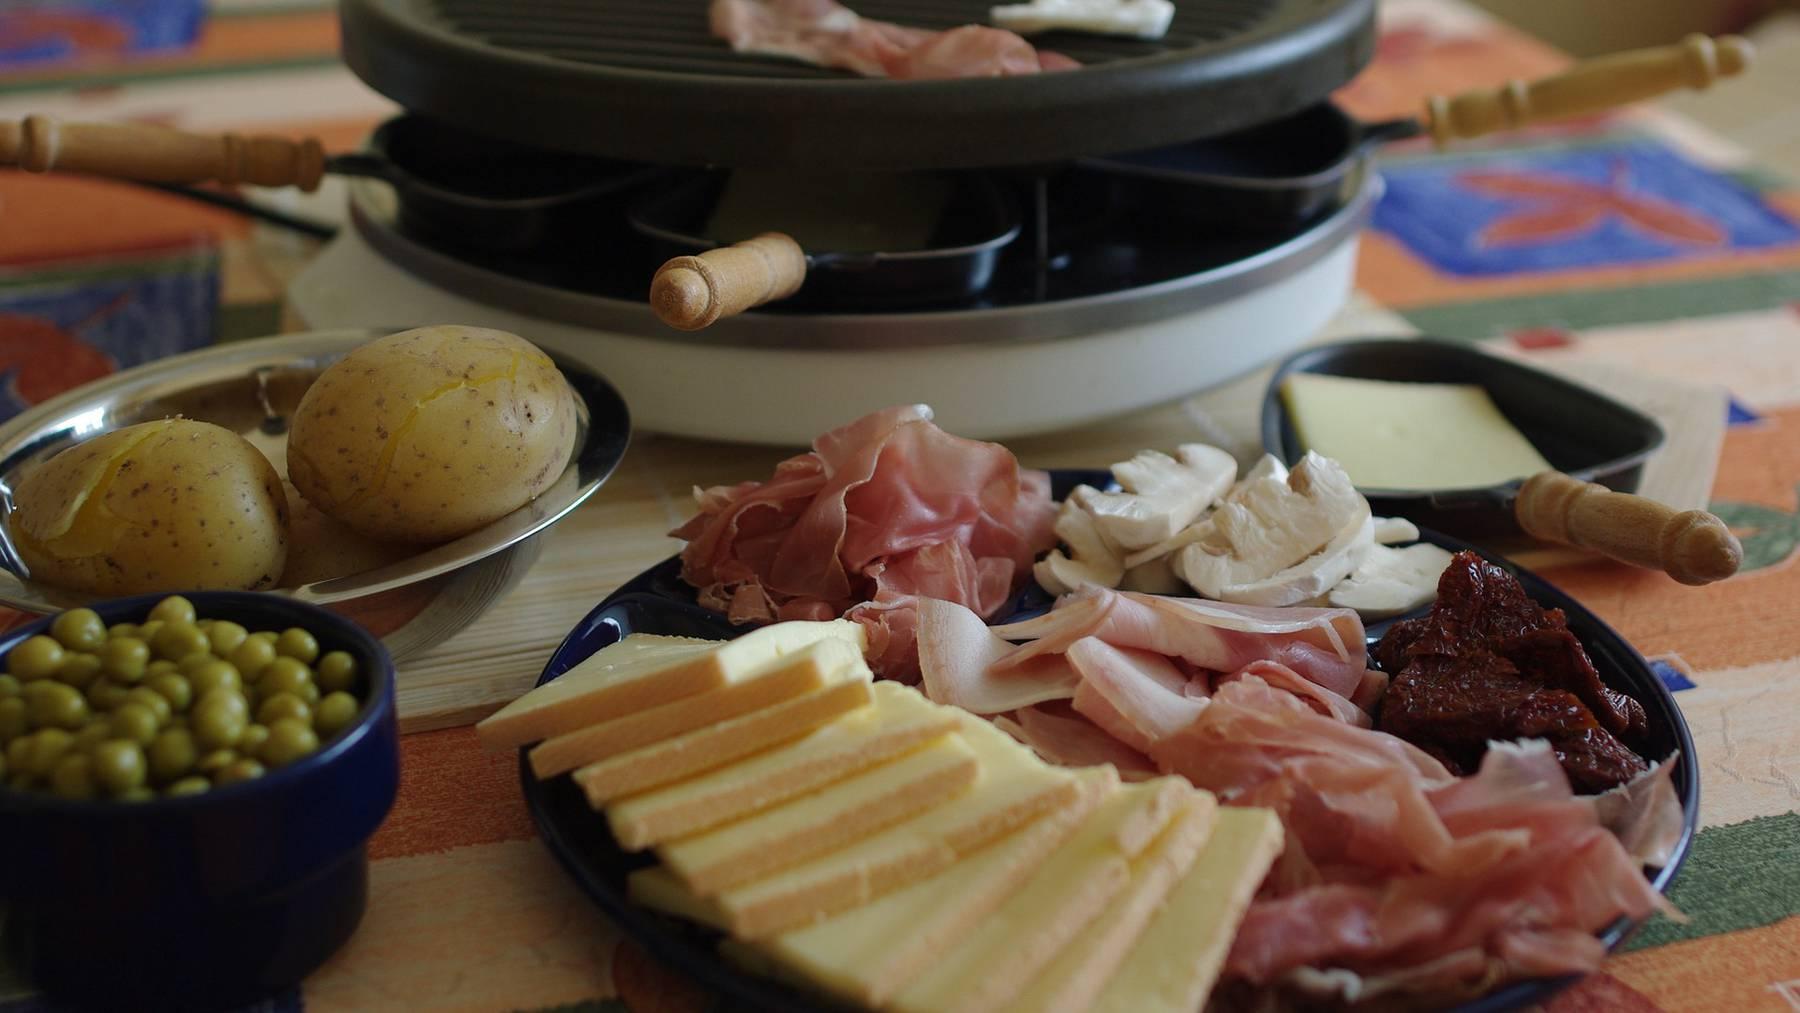 raclette-1293573_1920